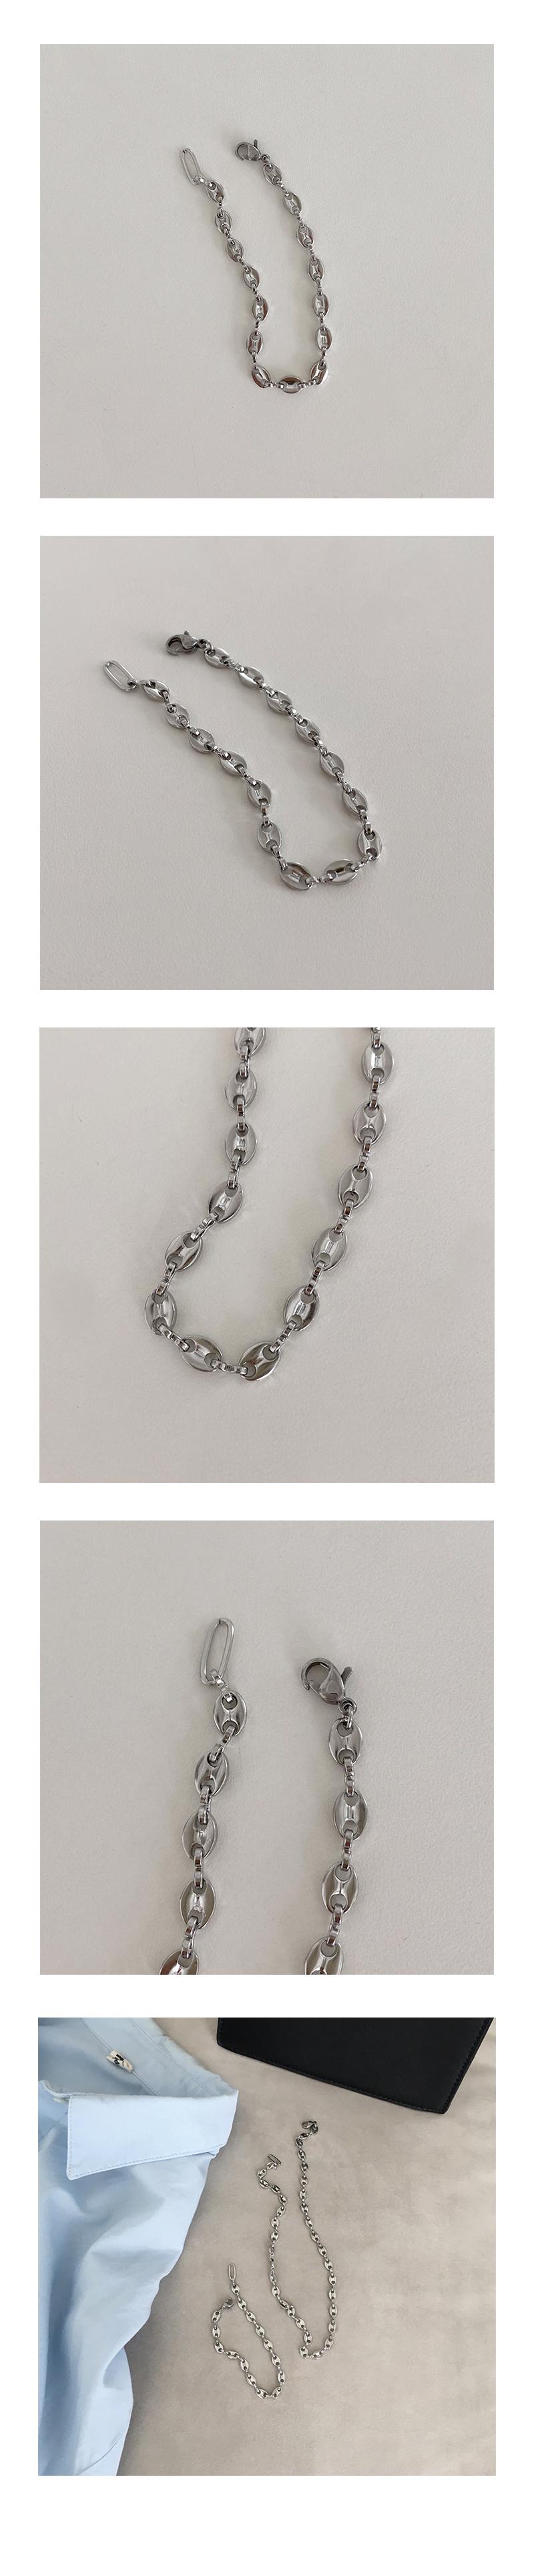 plug bracelet